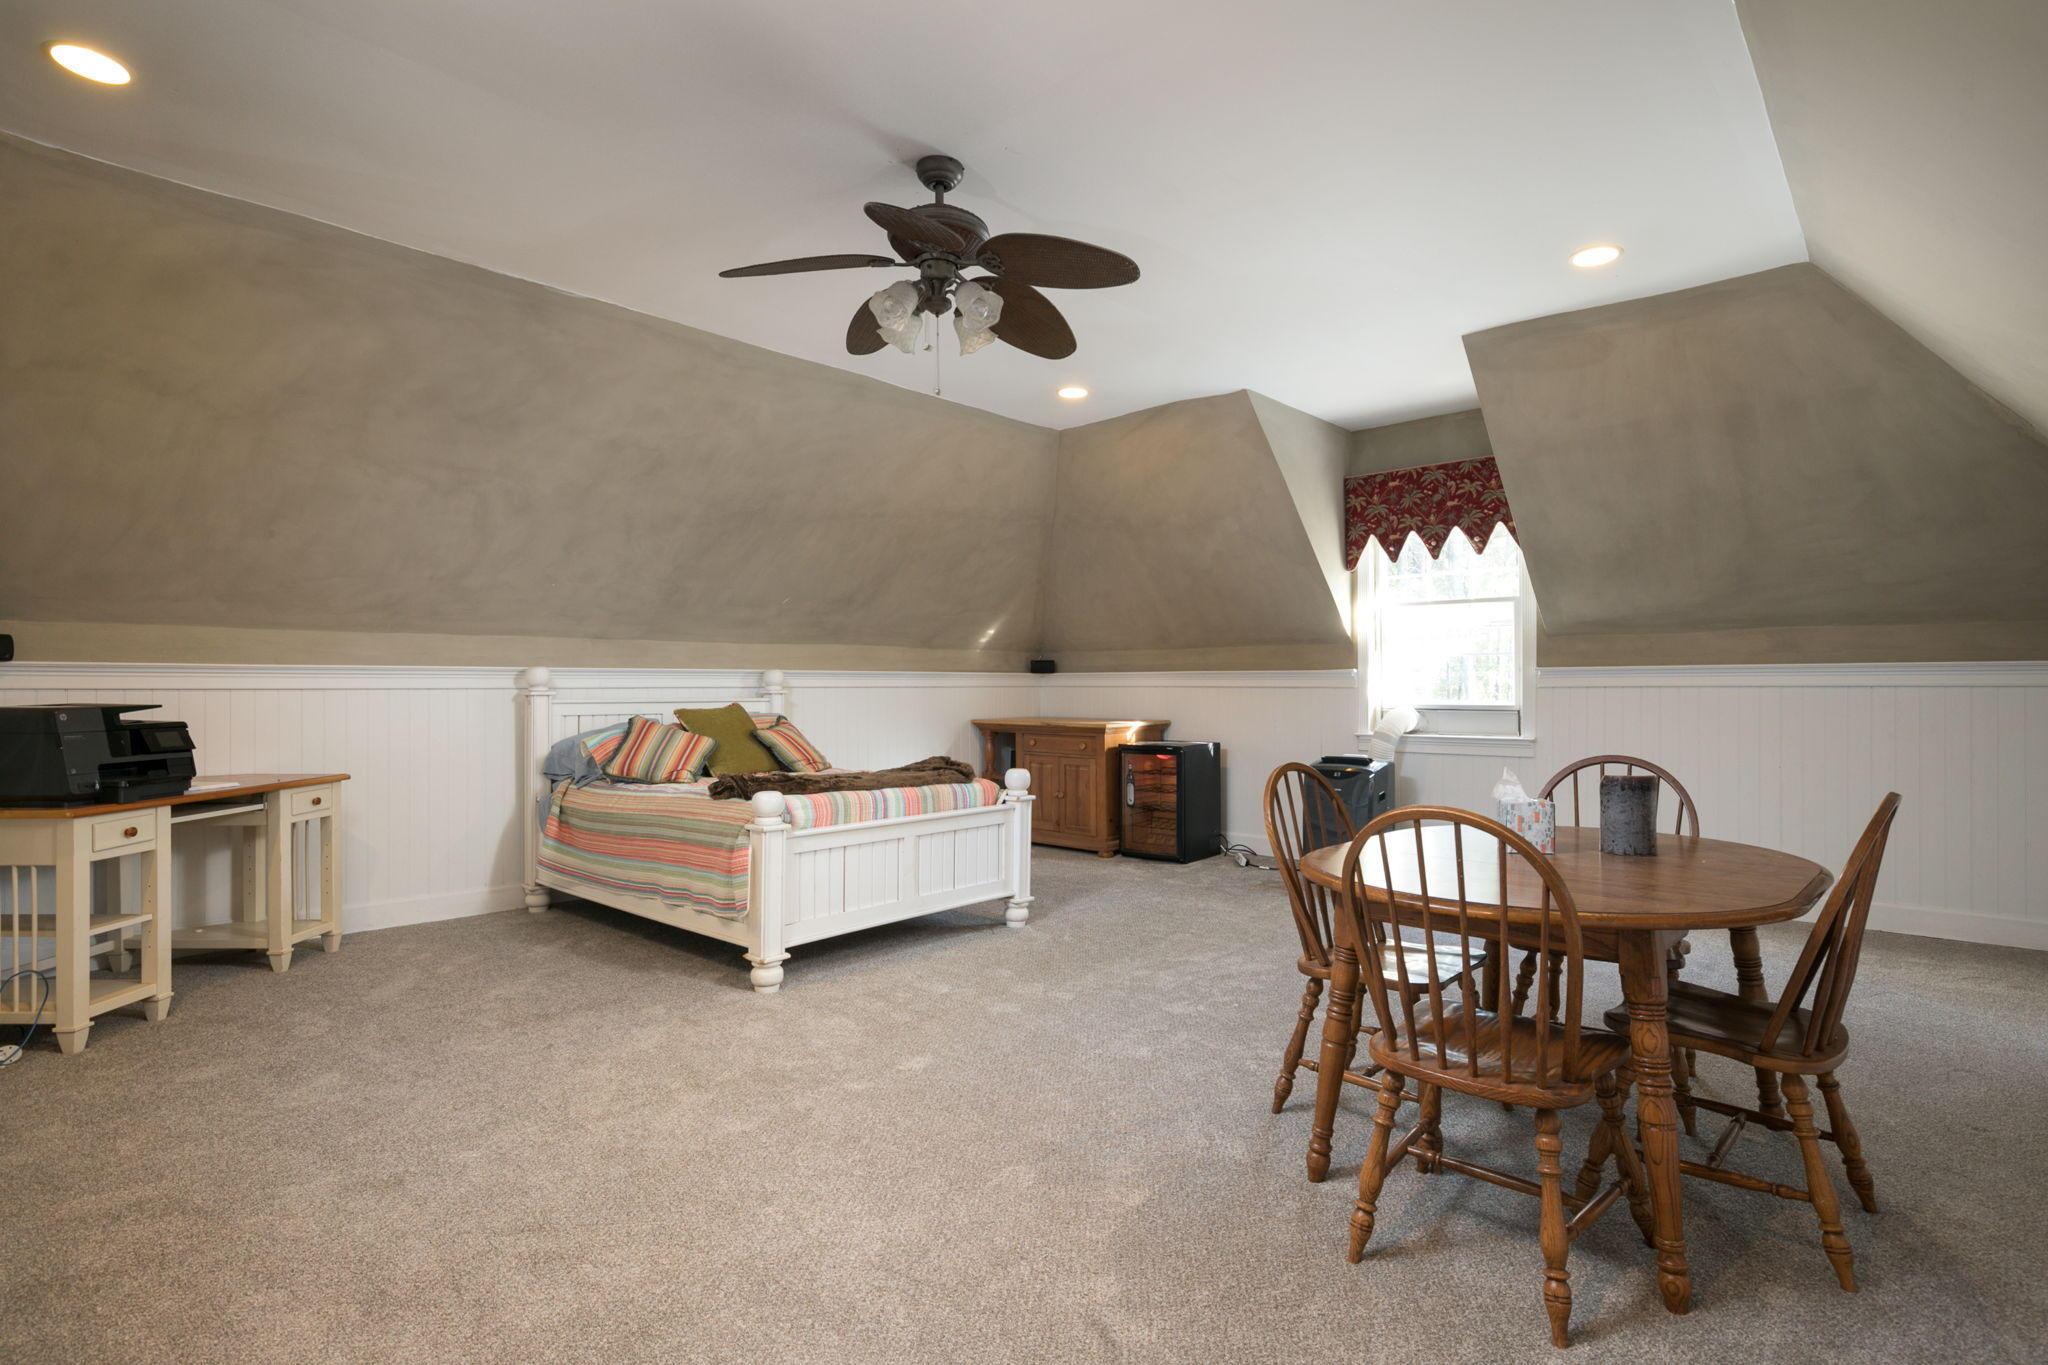 Dunes West Homes For Sale - 3625 Colonel Vanderhorst, Mount Pleasant, SC - 13